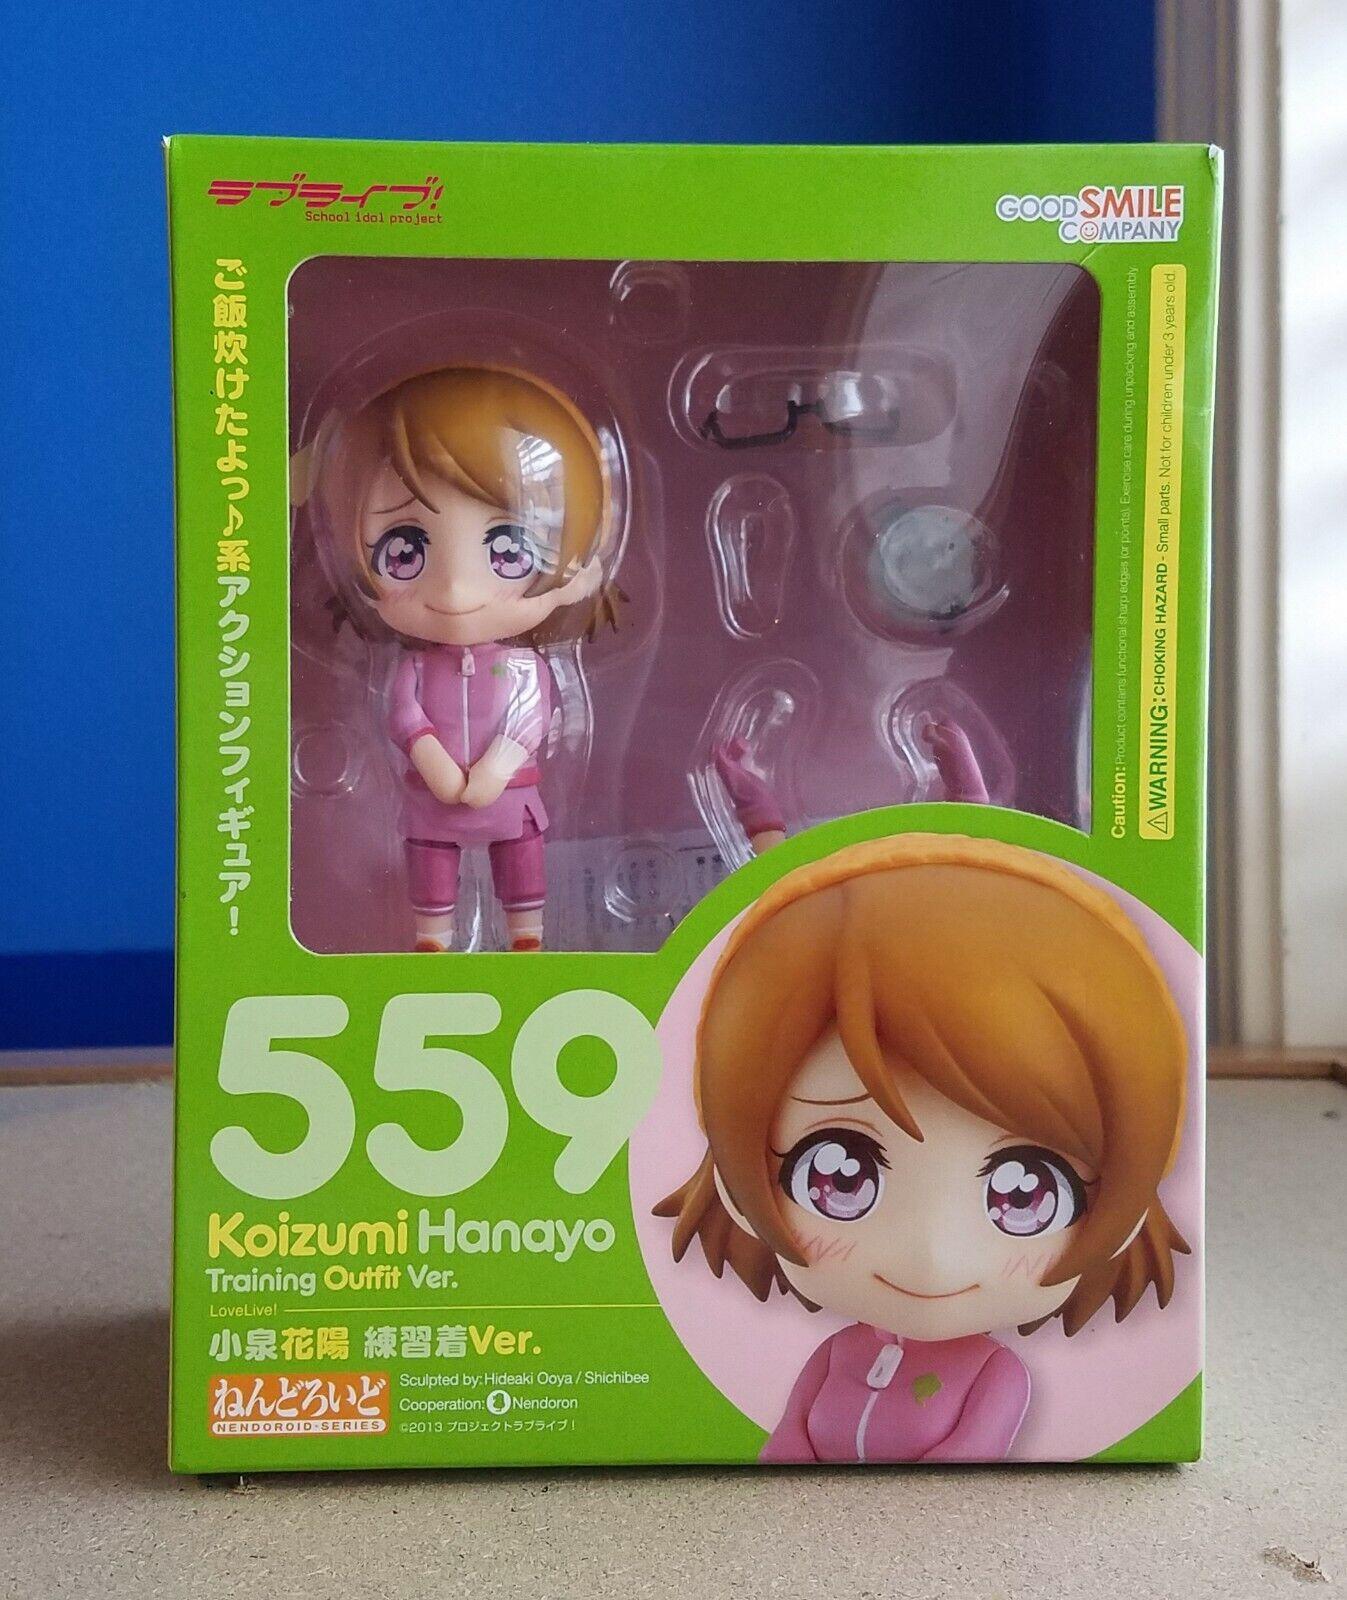 USED Nendoroid Love Live Koizumi Hanayo Training Outfit ver Figure Good Smile